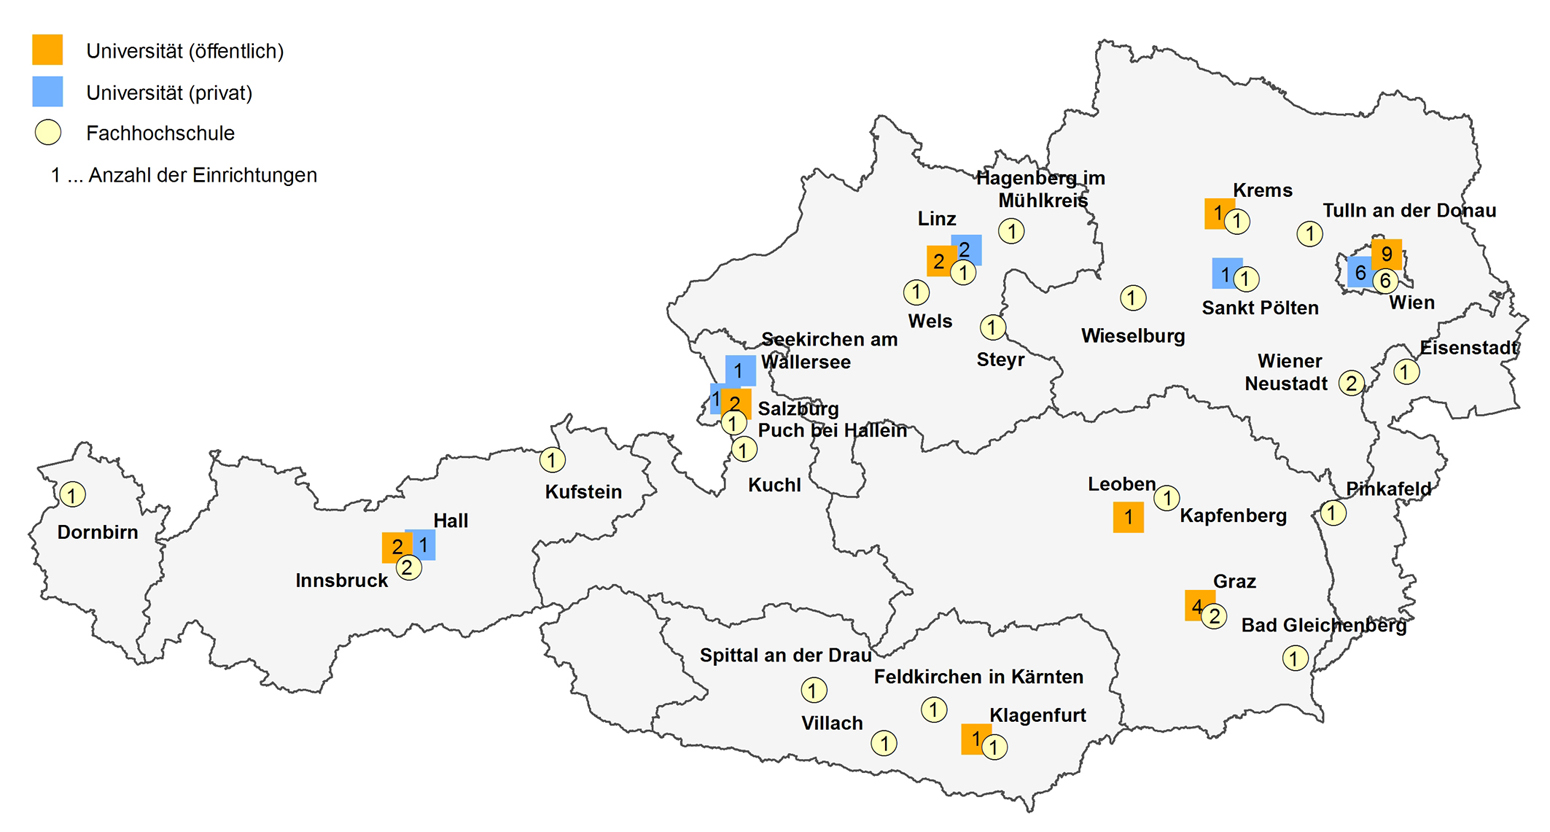 bundesländer mit landeshauptstädten kitzbühel